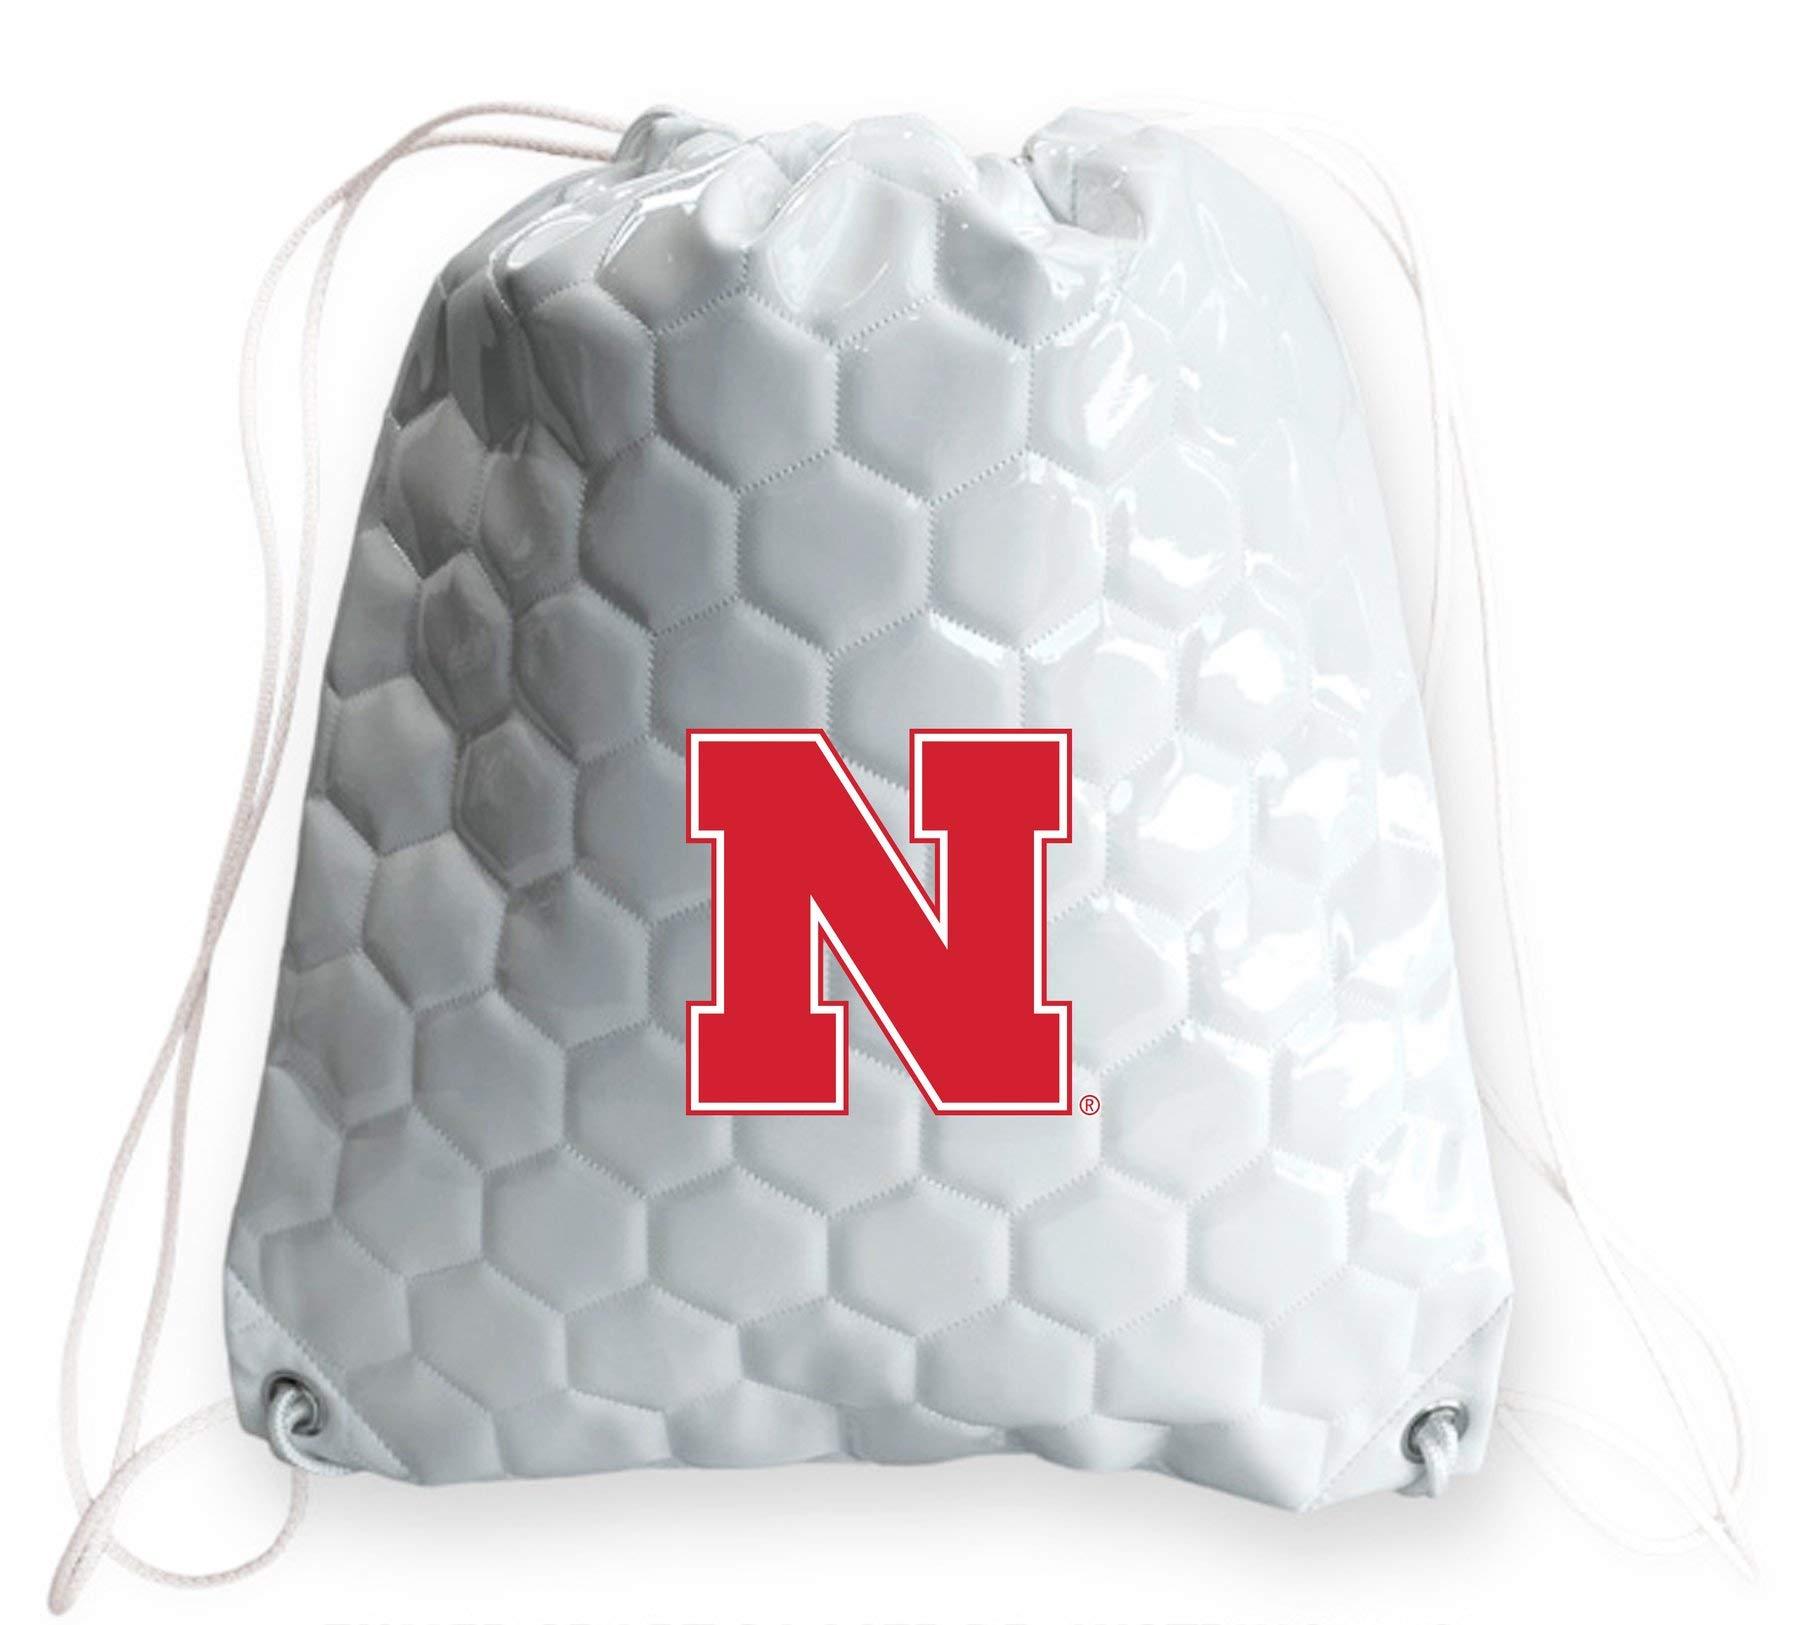 Zumer Sport Nebraska Cornhuskers Soccer Ball Leather Drawstring Shoulder Backpack Bag - Made from The Same Exact Materials as a Soccer Ball - White